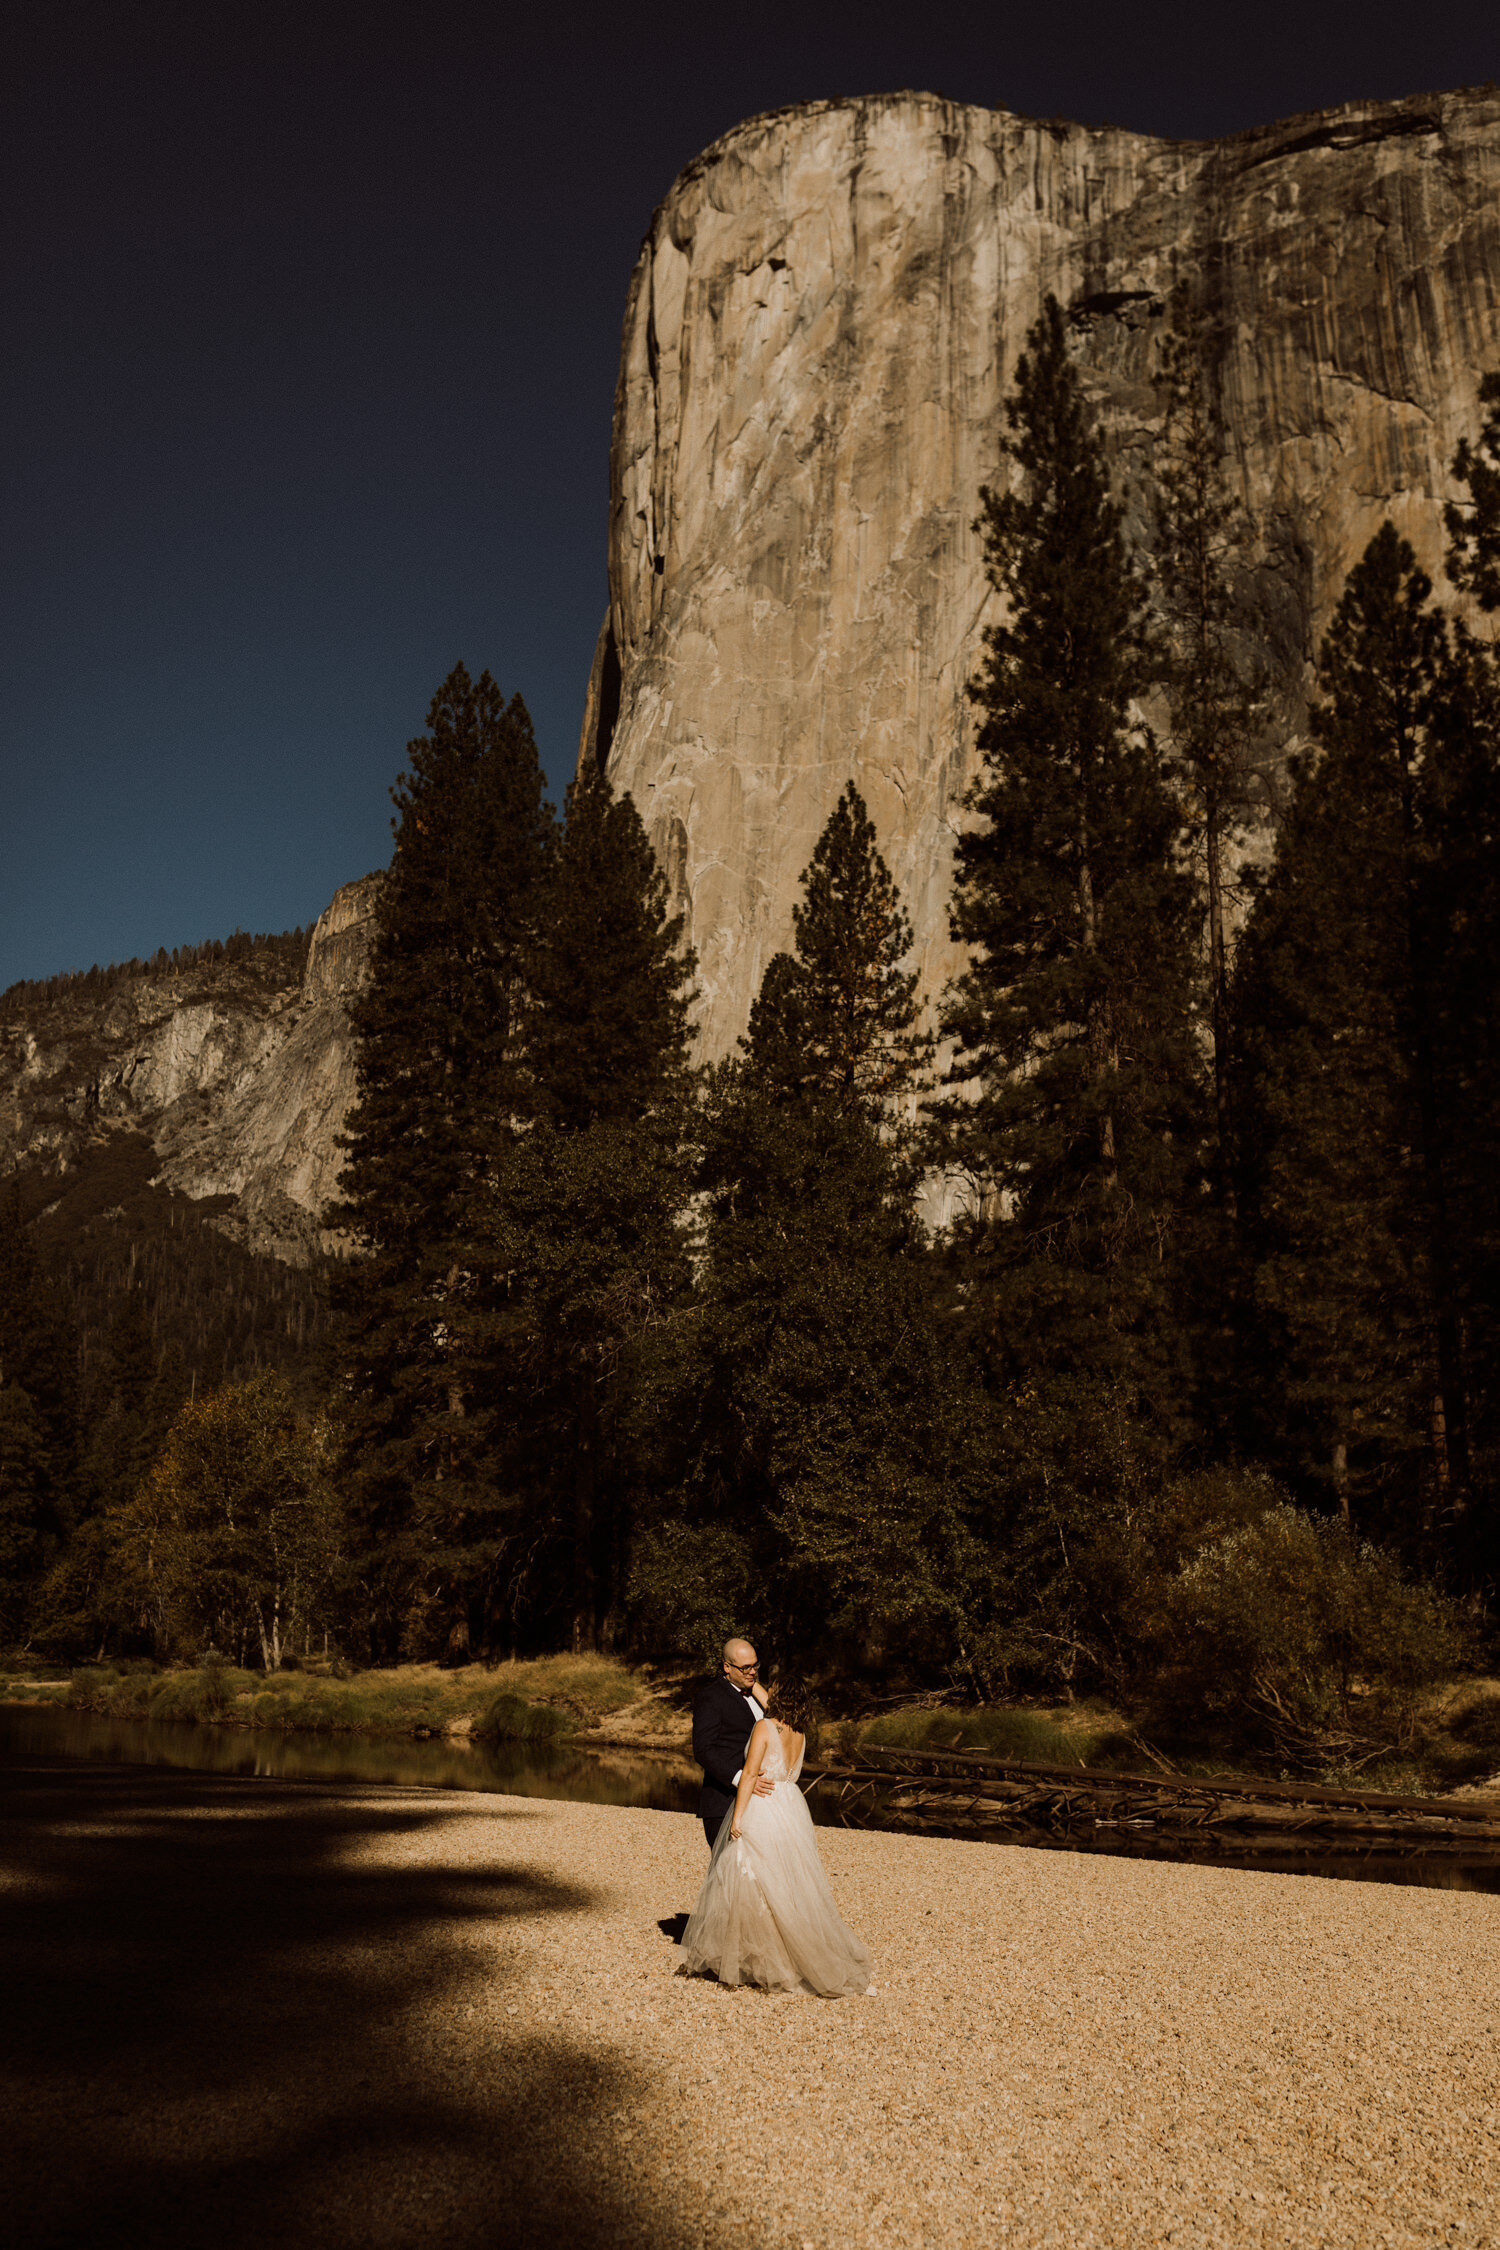 adventure-wedding-yosemite-national-park-23.jpg